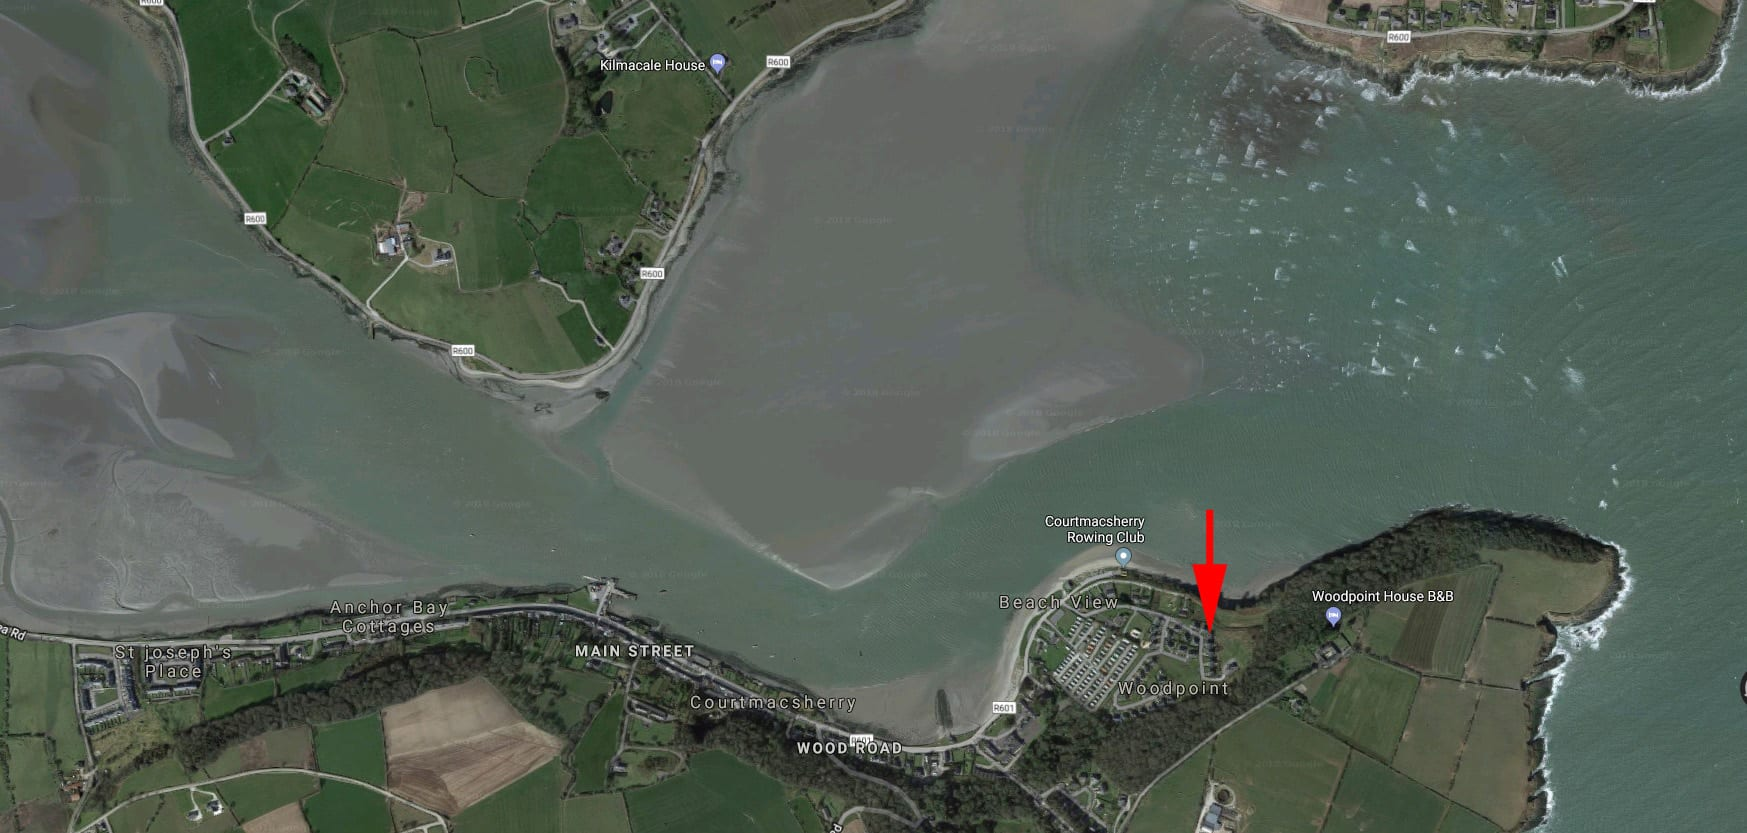 15. Satellite View